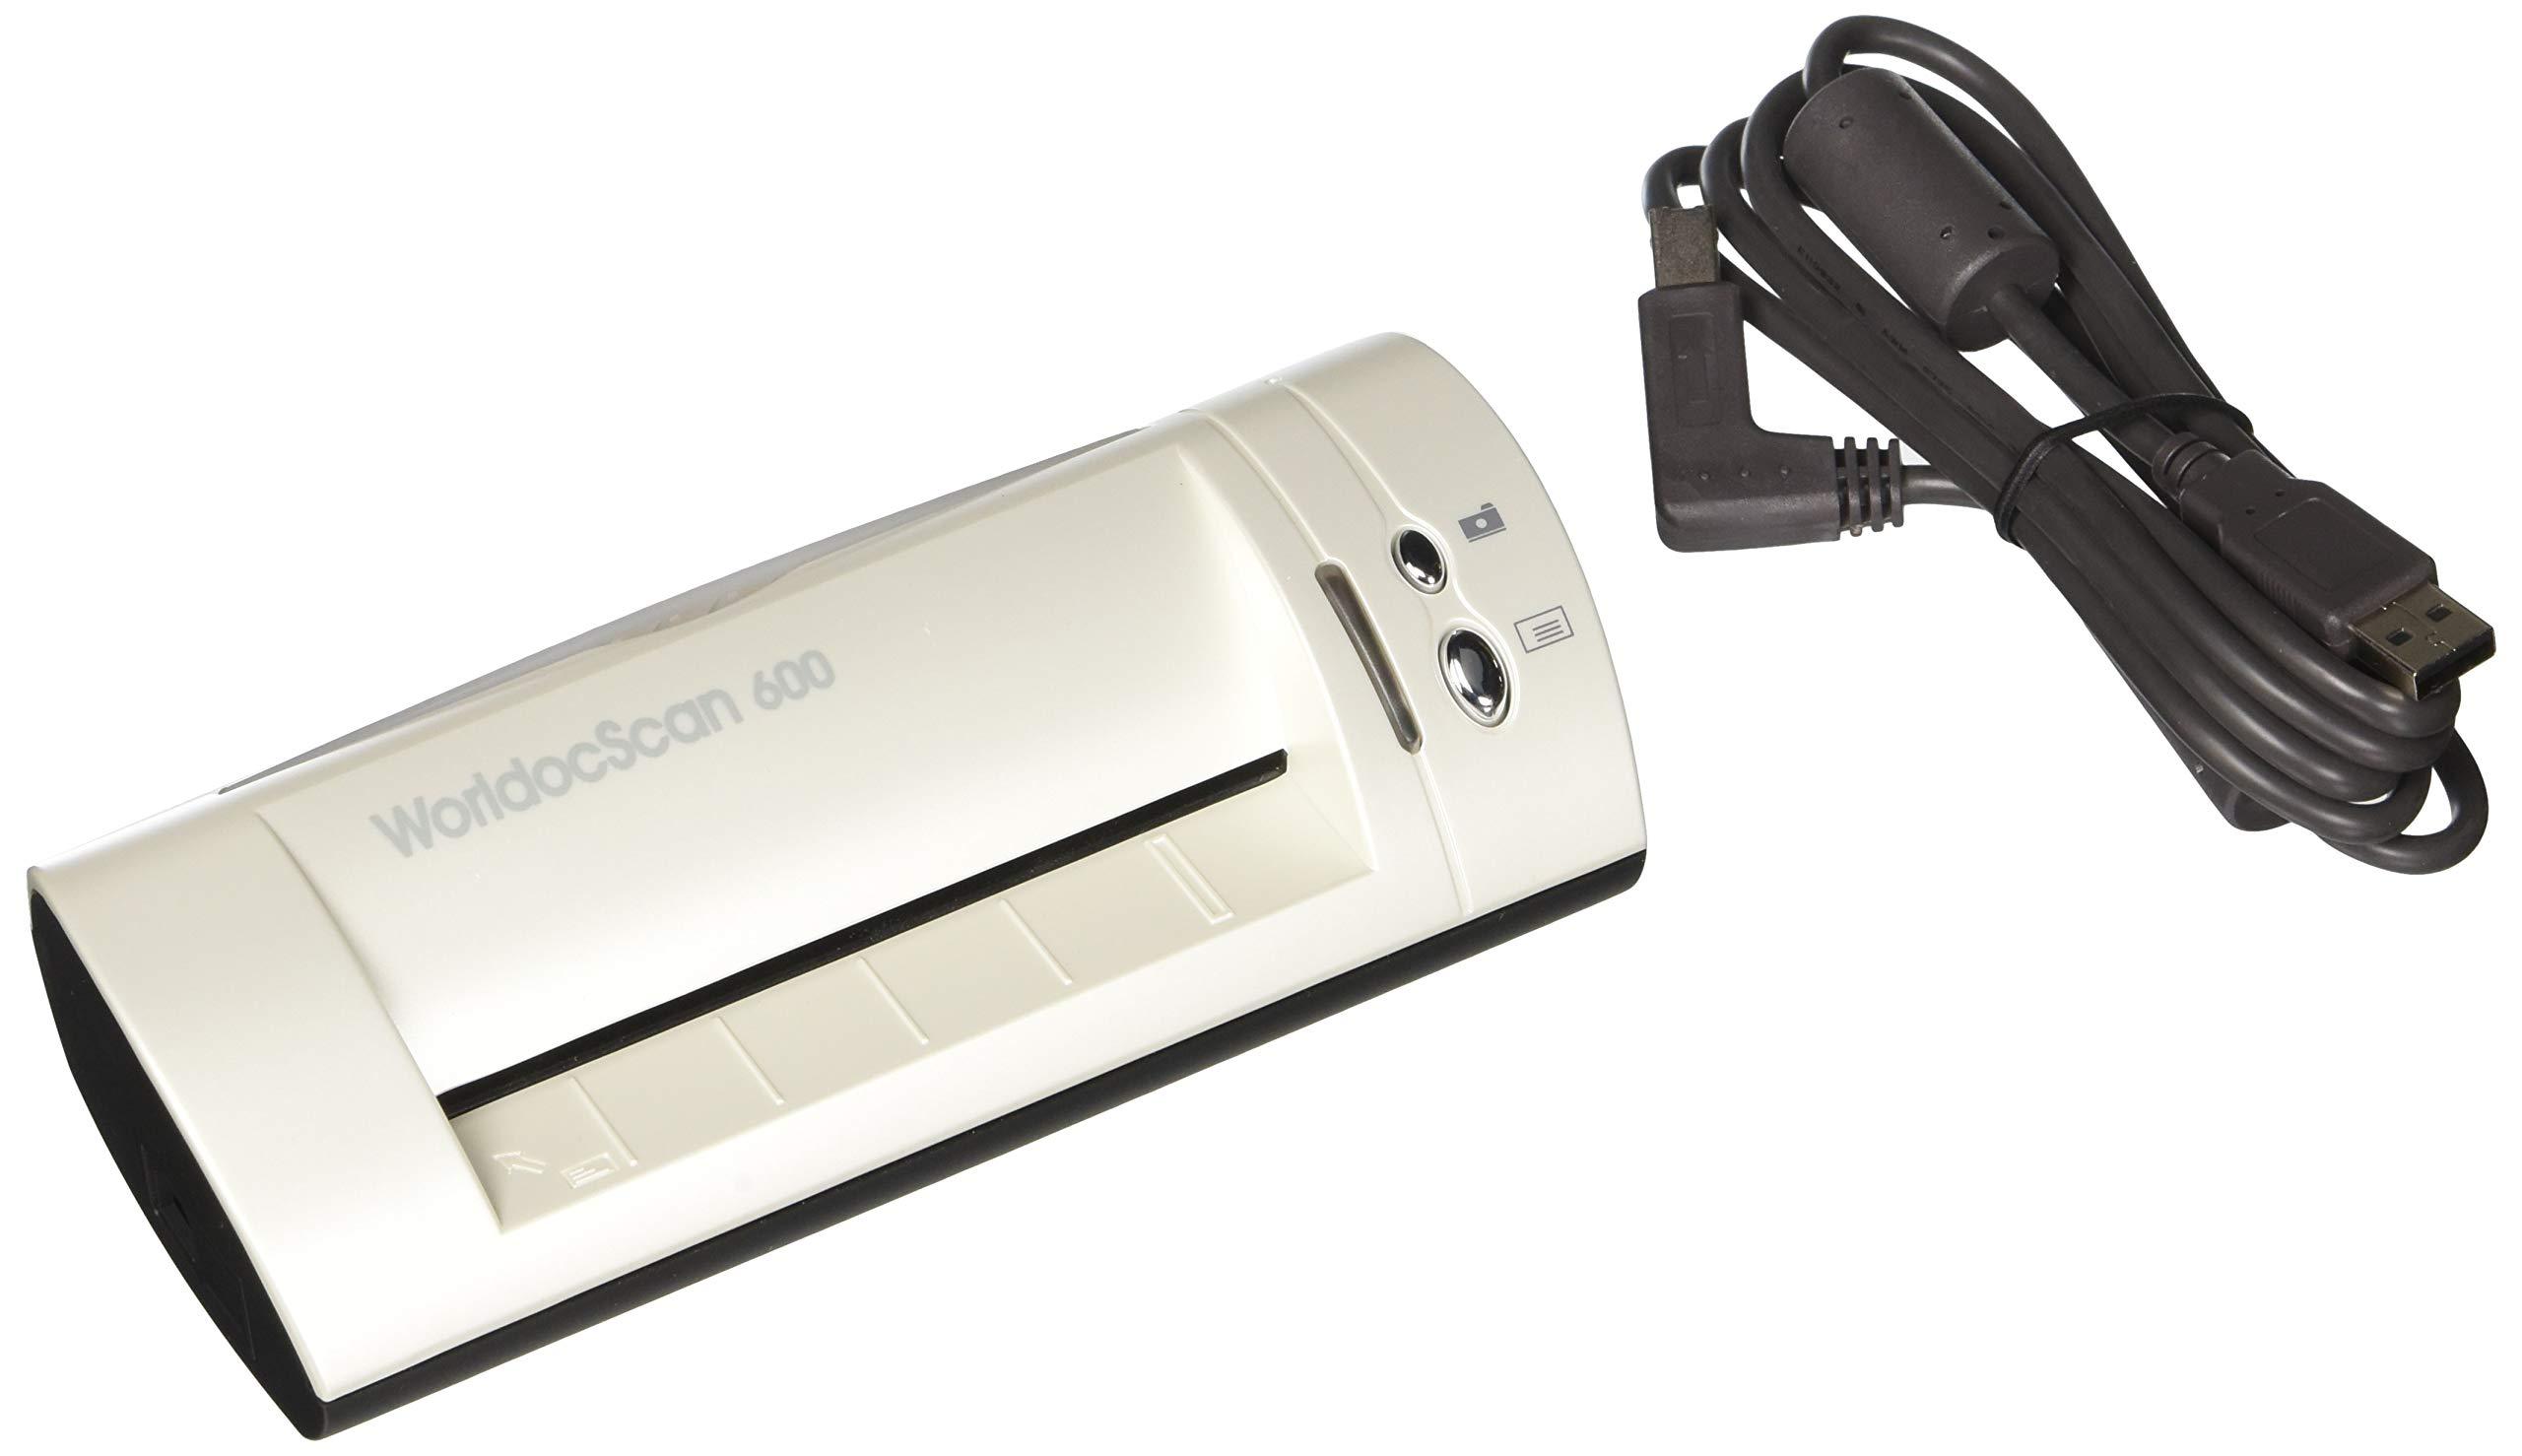 Penpower Portable Color ID Card Scanner (Penpower WorldocScan 600)